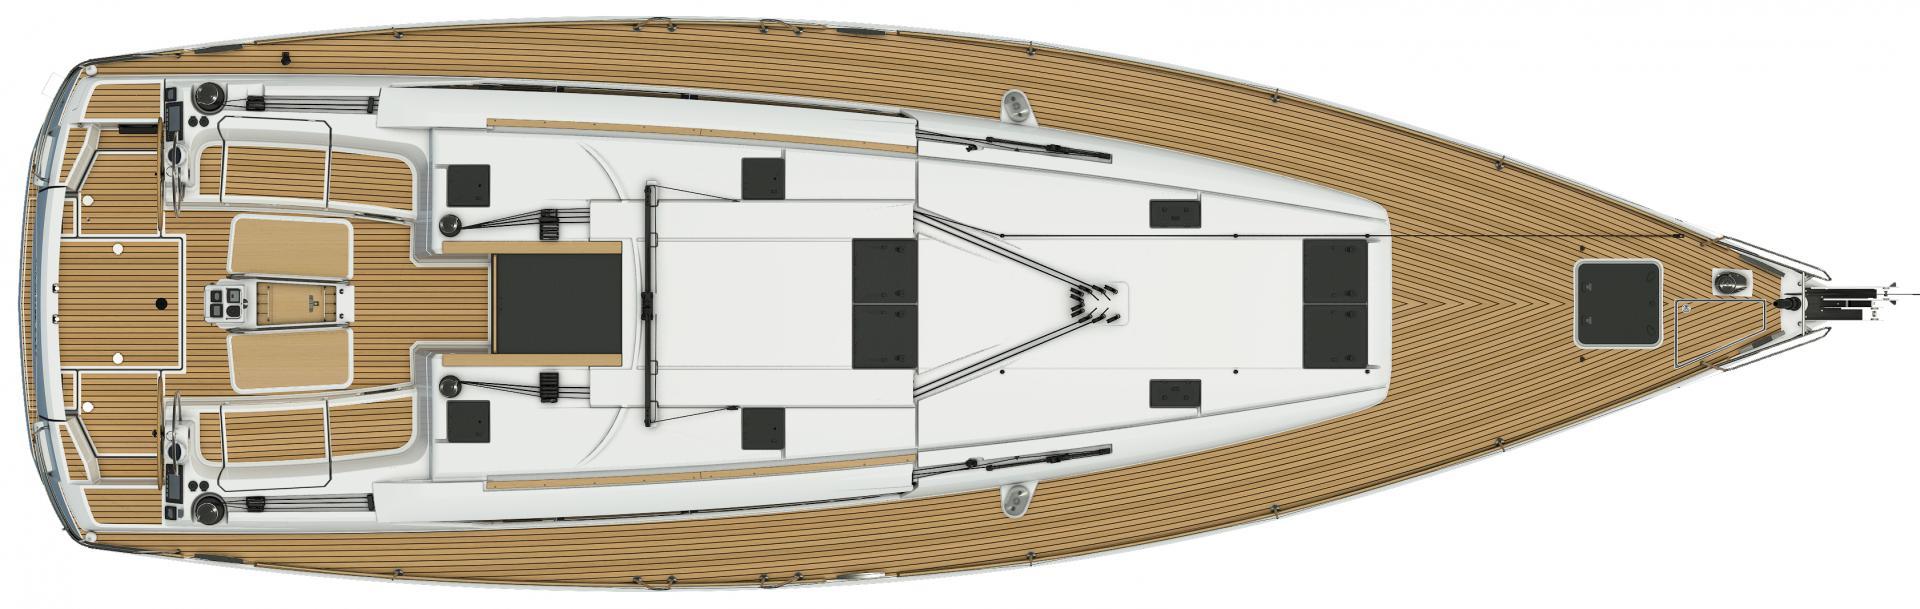 Sun Odyssey 509 | Jeanneau Boats